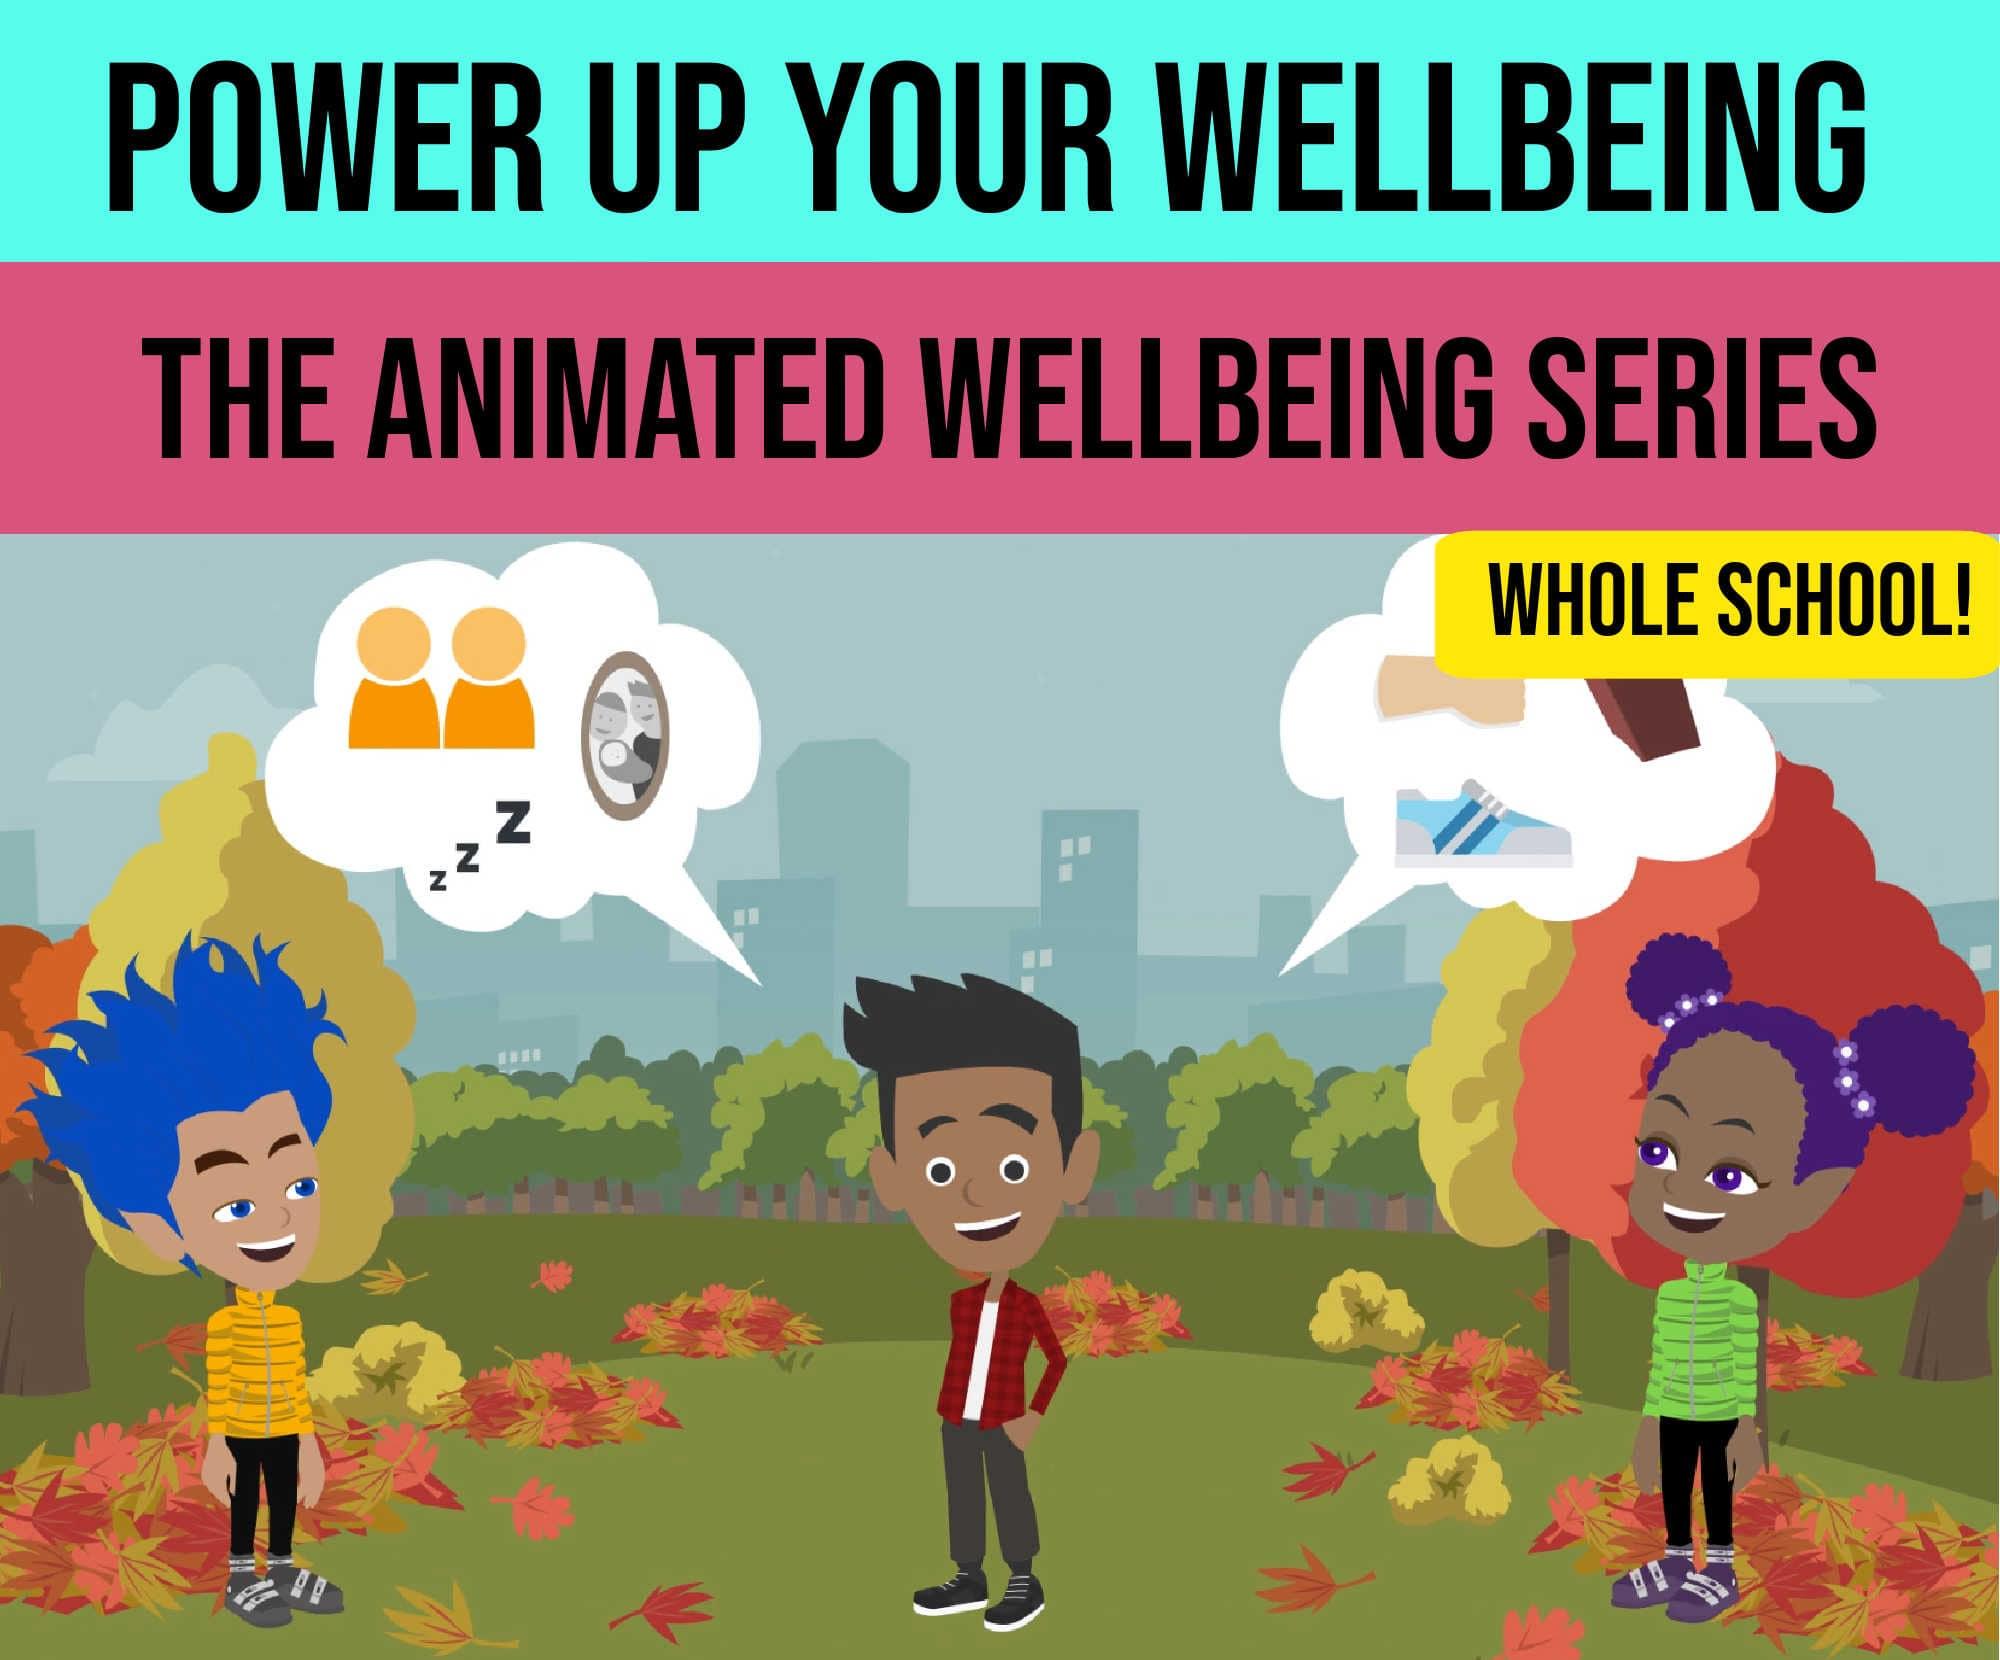 School Wellbeing Resources